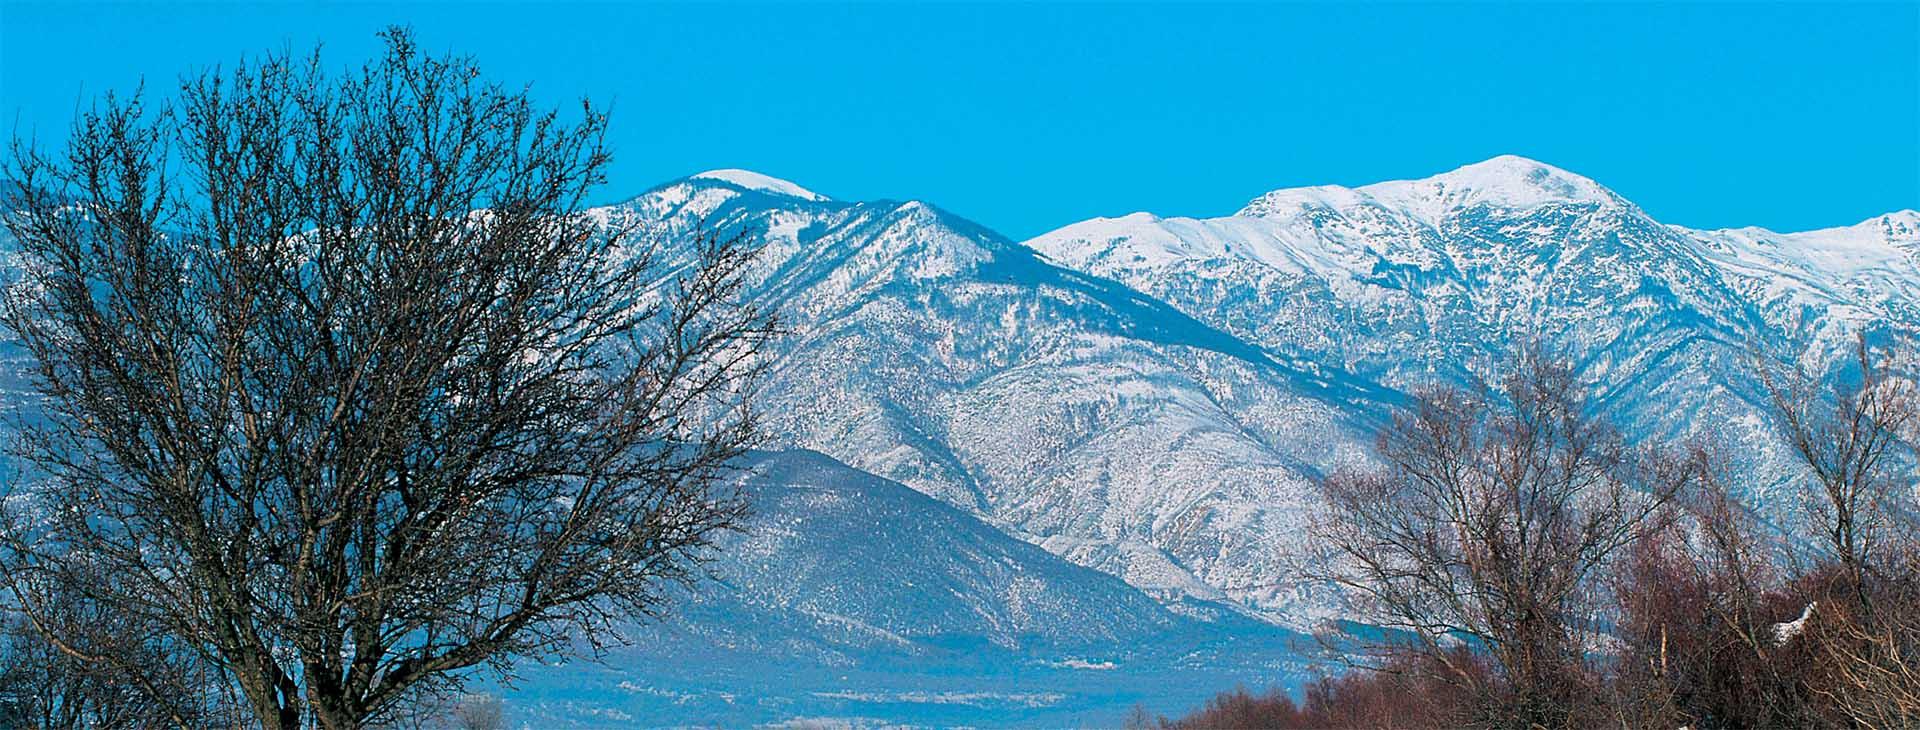 Mt. Belles, Kilkis